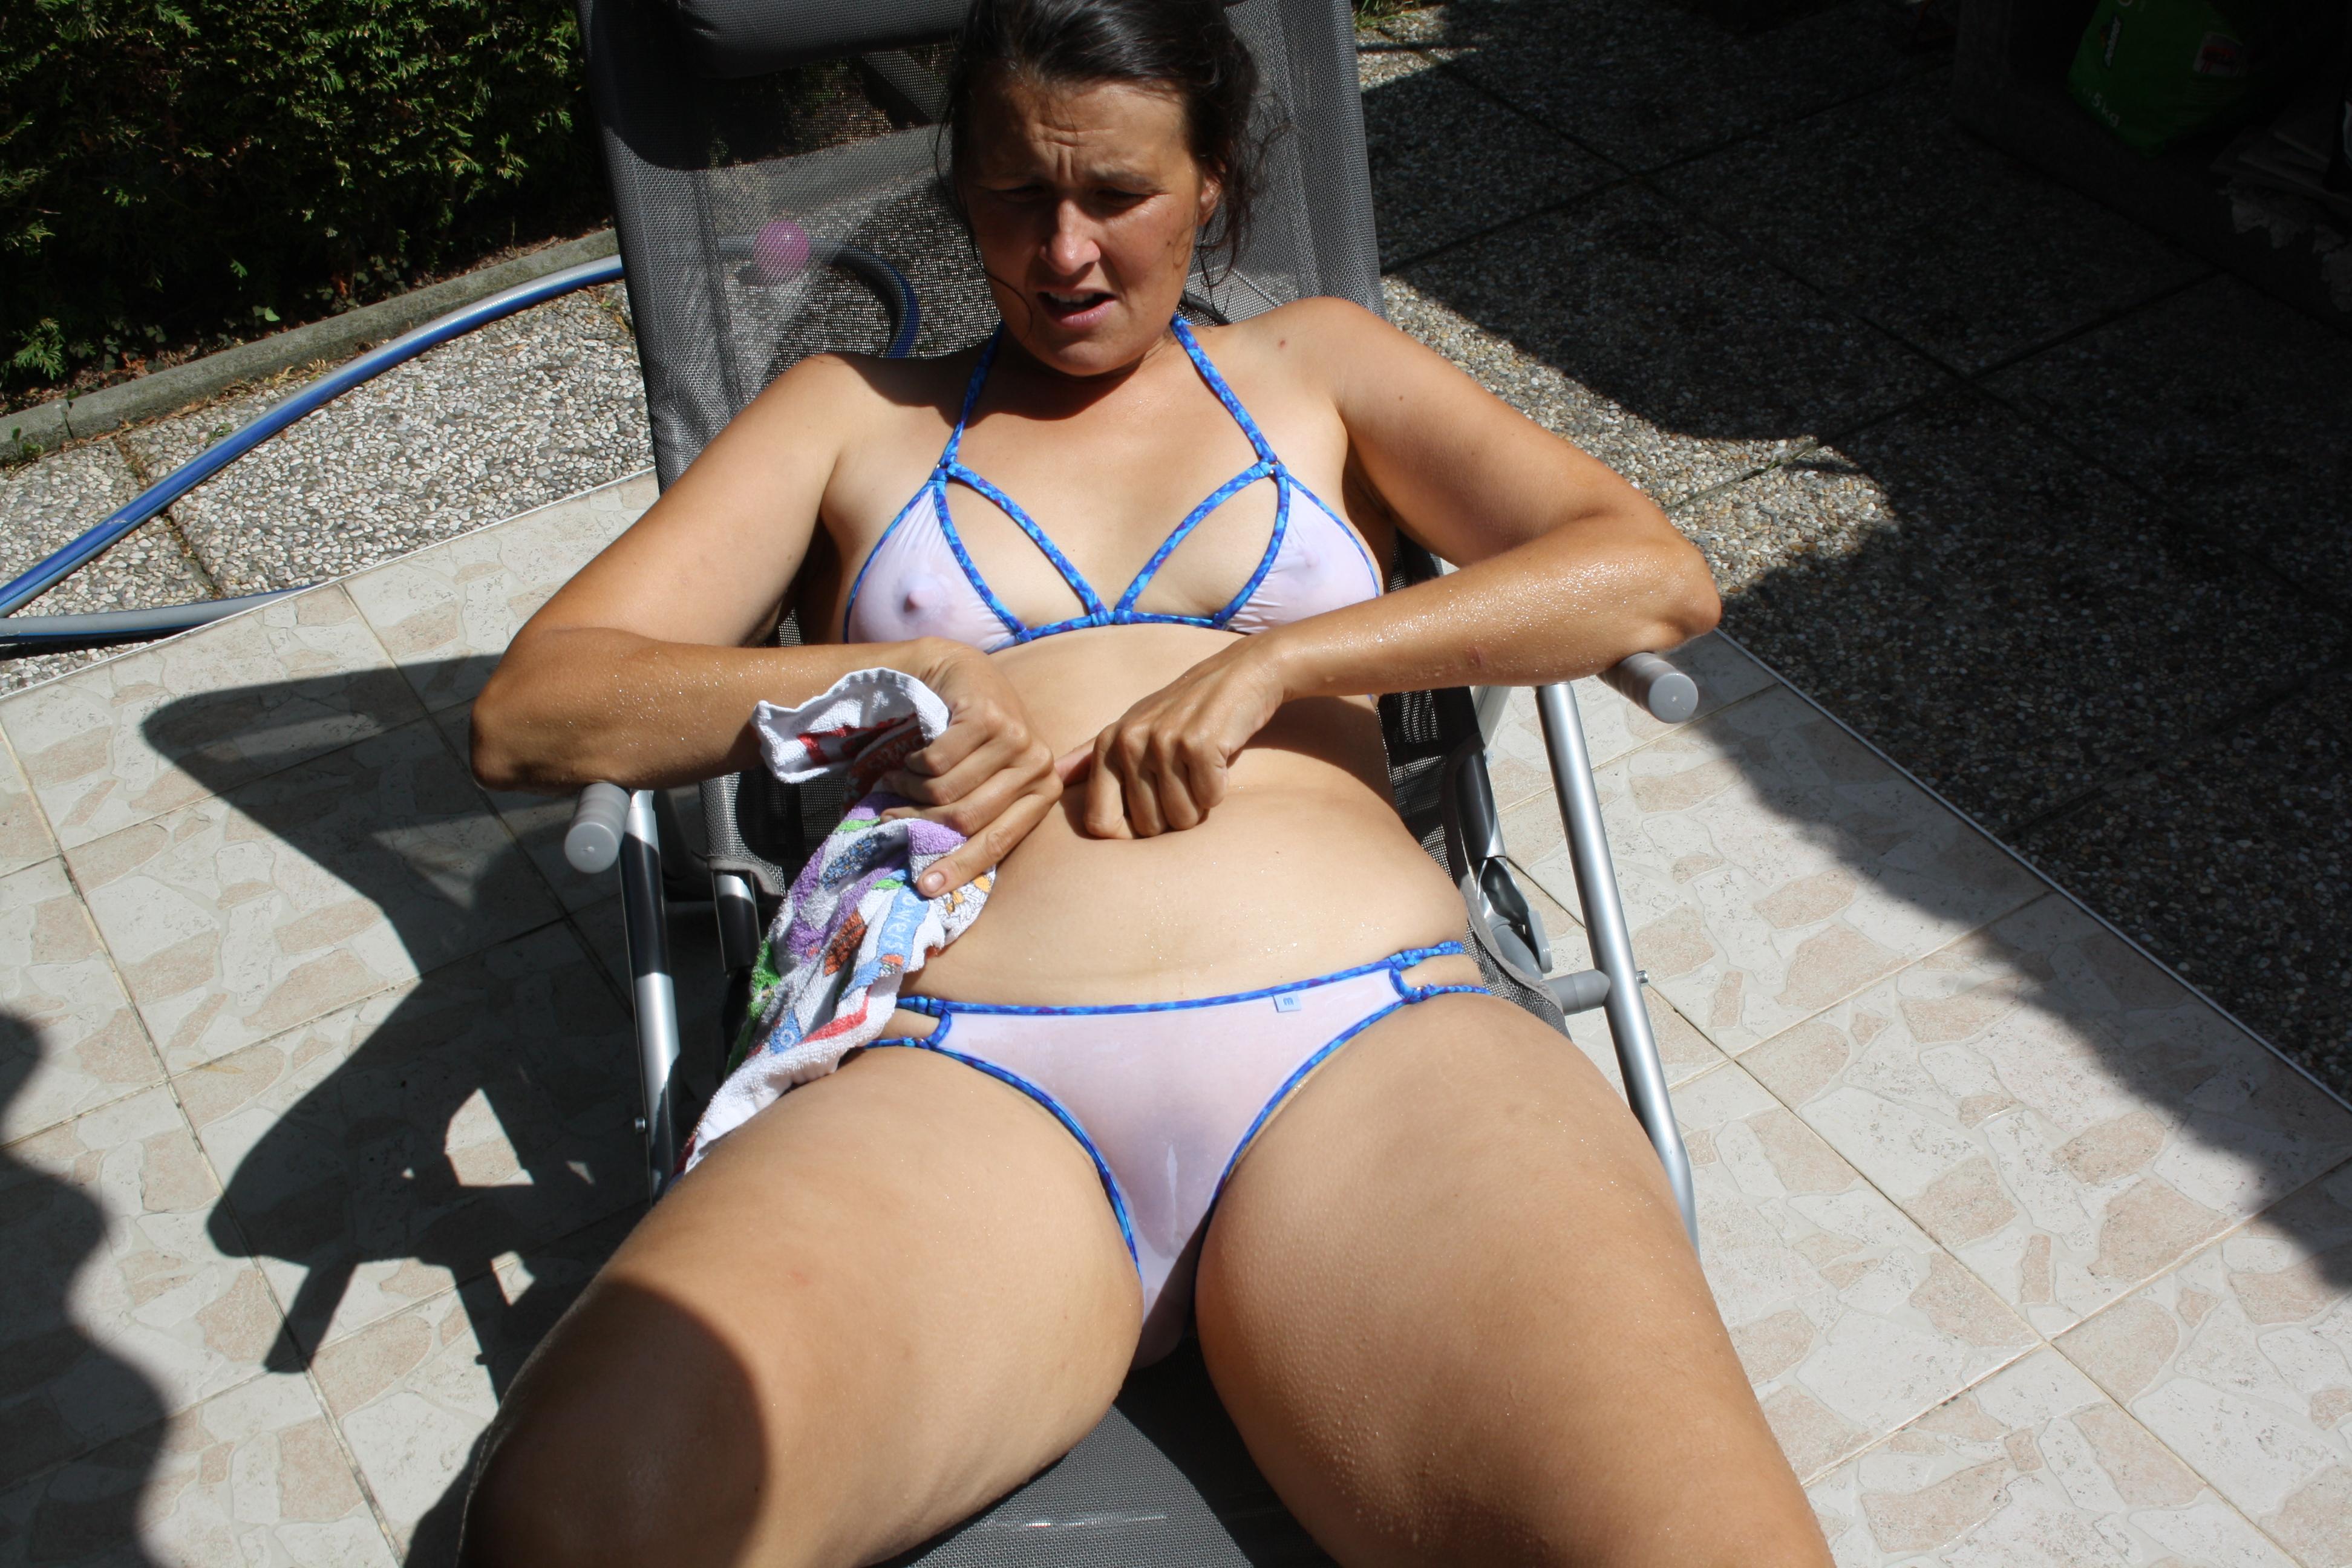 See through panties bikini amateur